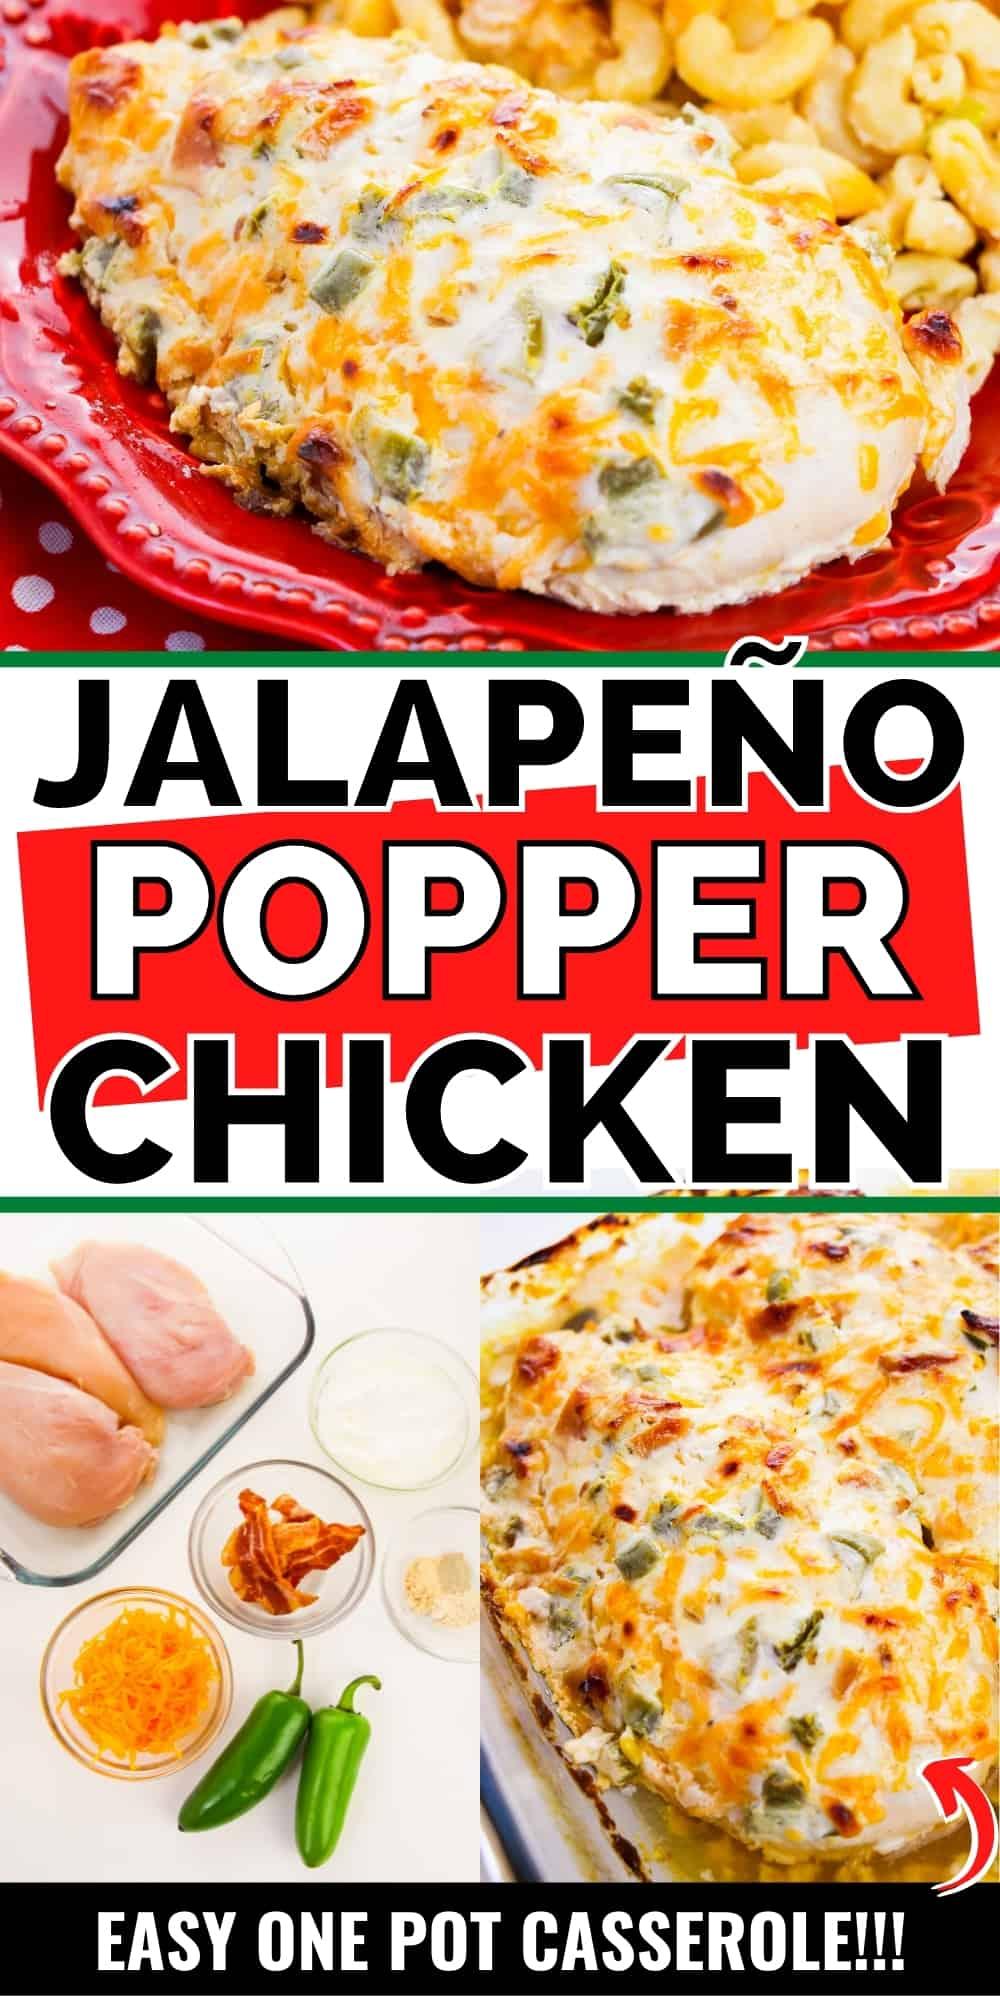 Pinterest image, reads: Jalapeno popper chicken, easy one pot casserole